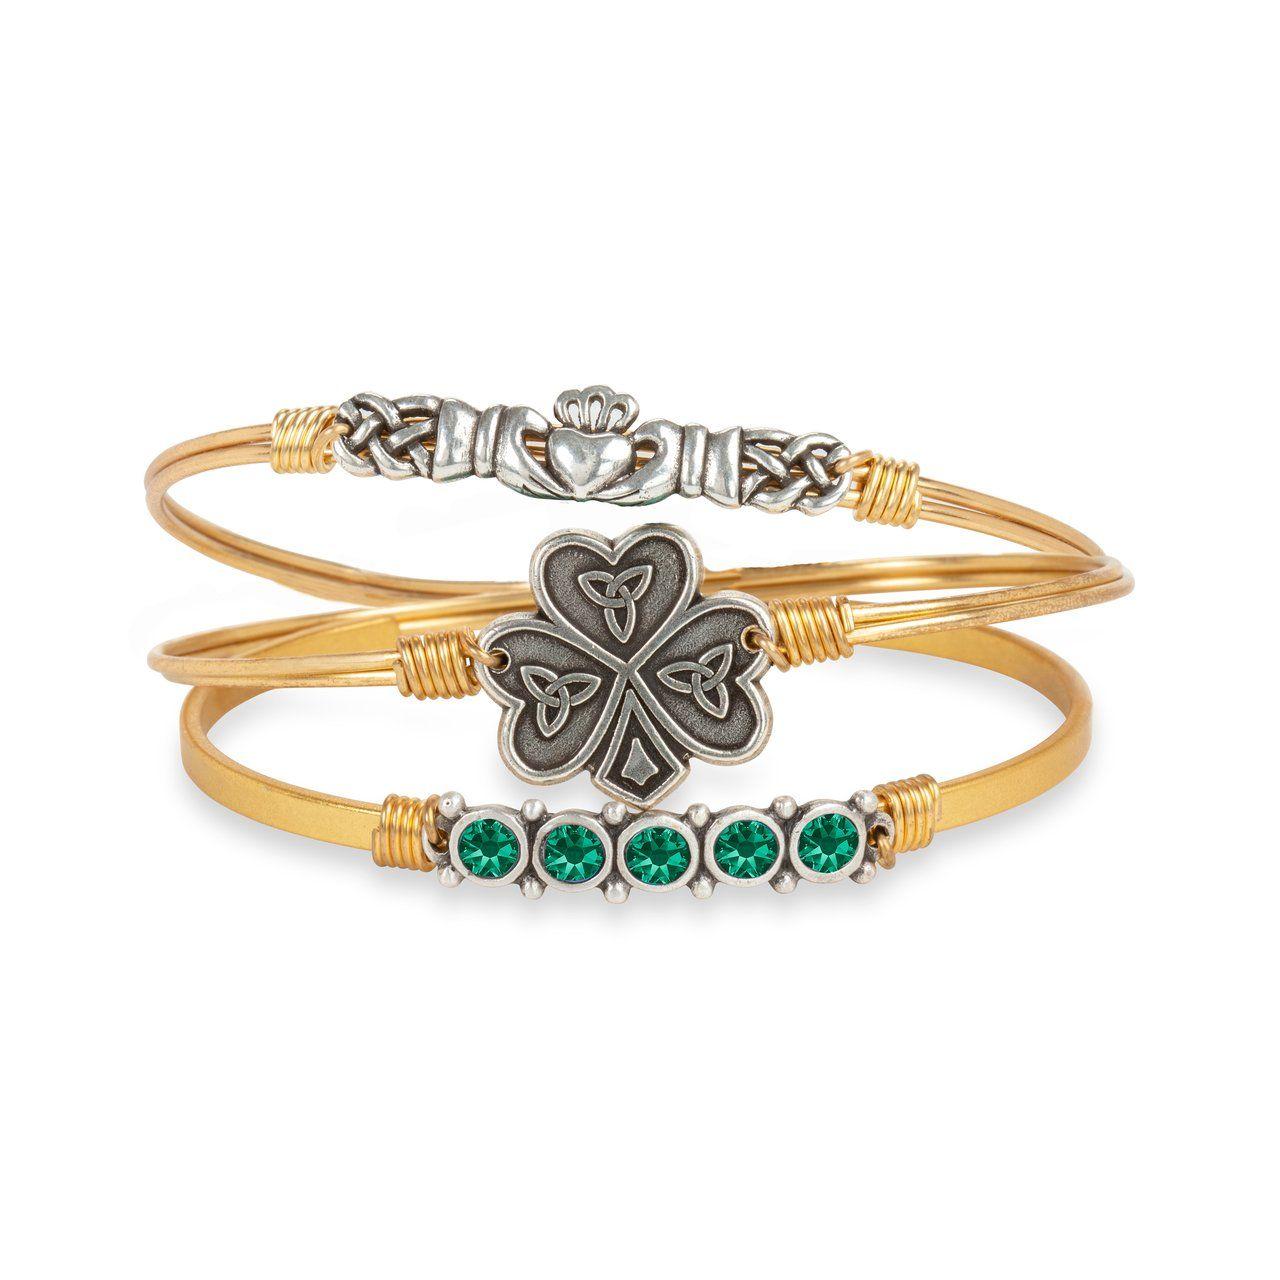 eb85e31c48499 Claddagh Bangle Bracelet - Regular / Brass Tone | Gifts | Bangle ...